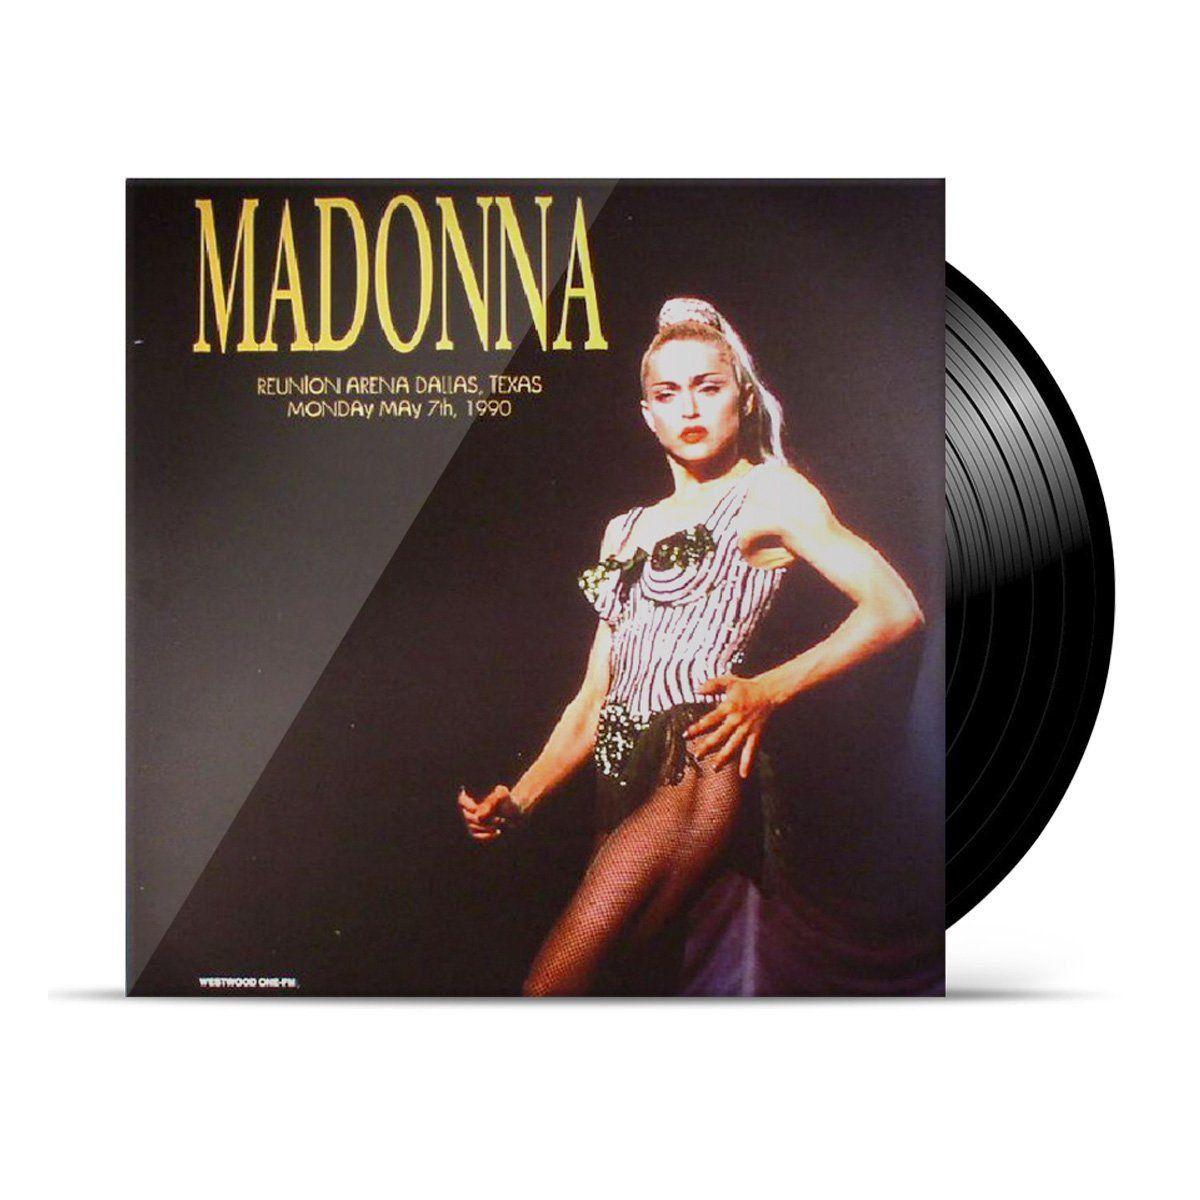 LP Duplo Madonna Blond Ambition World Tour 90  - bandUP Store Marketplace